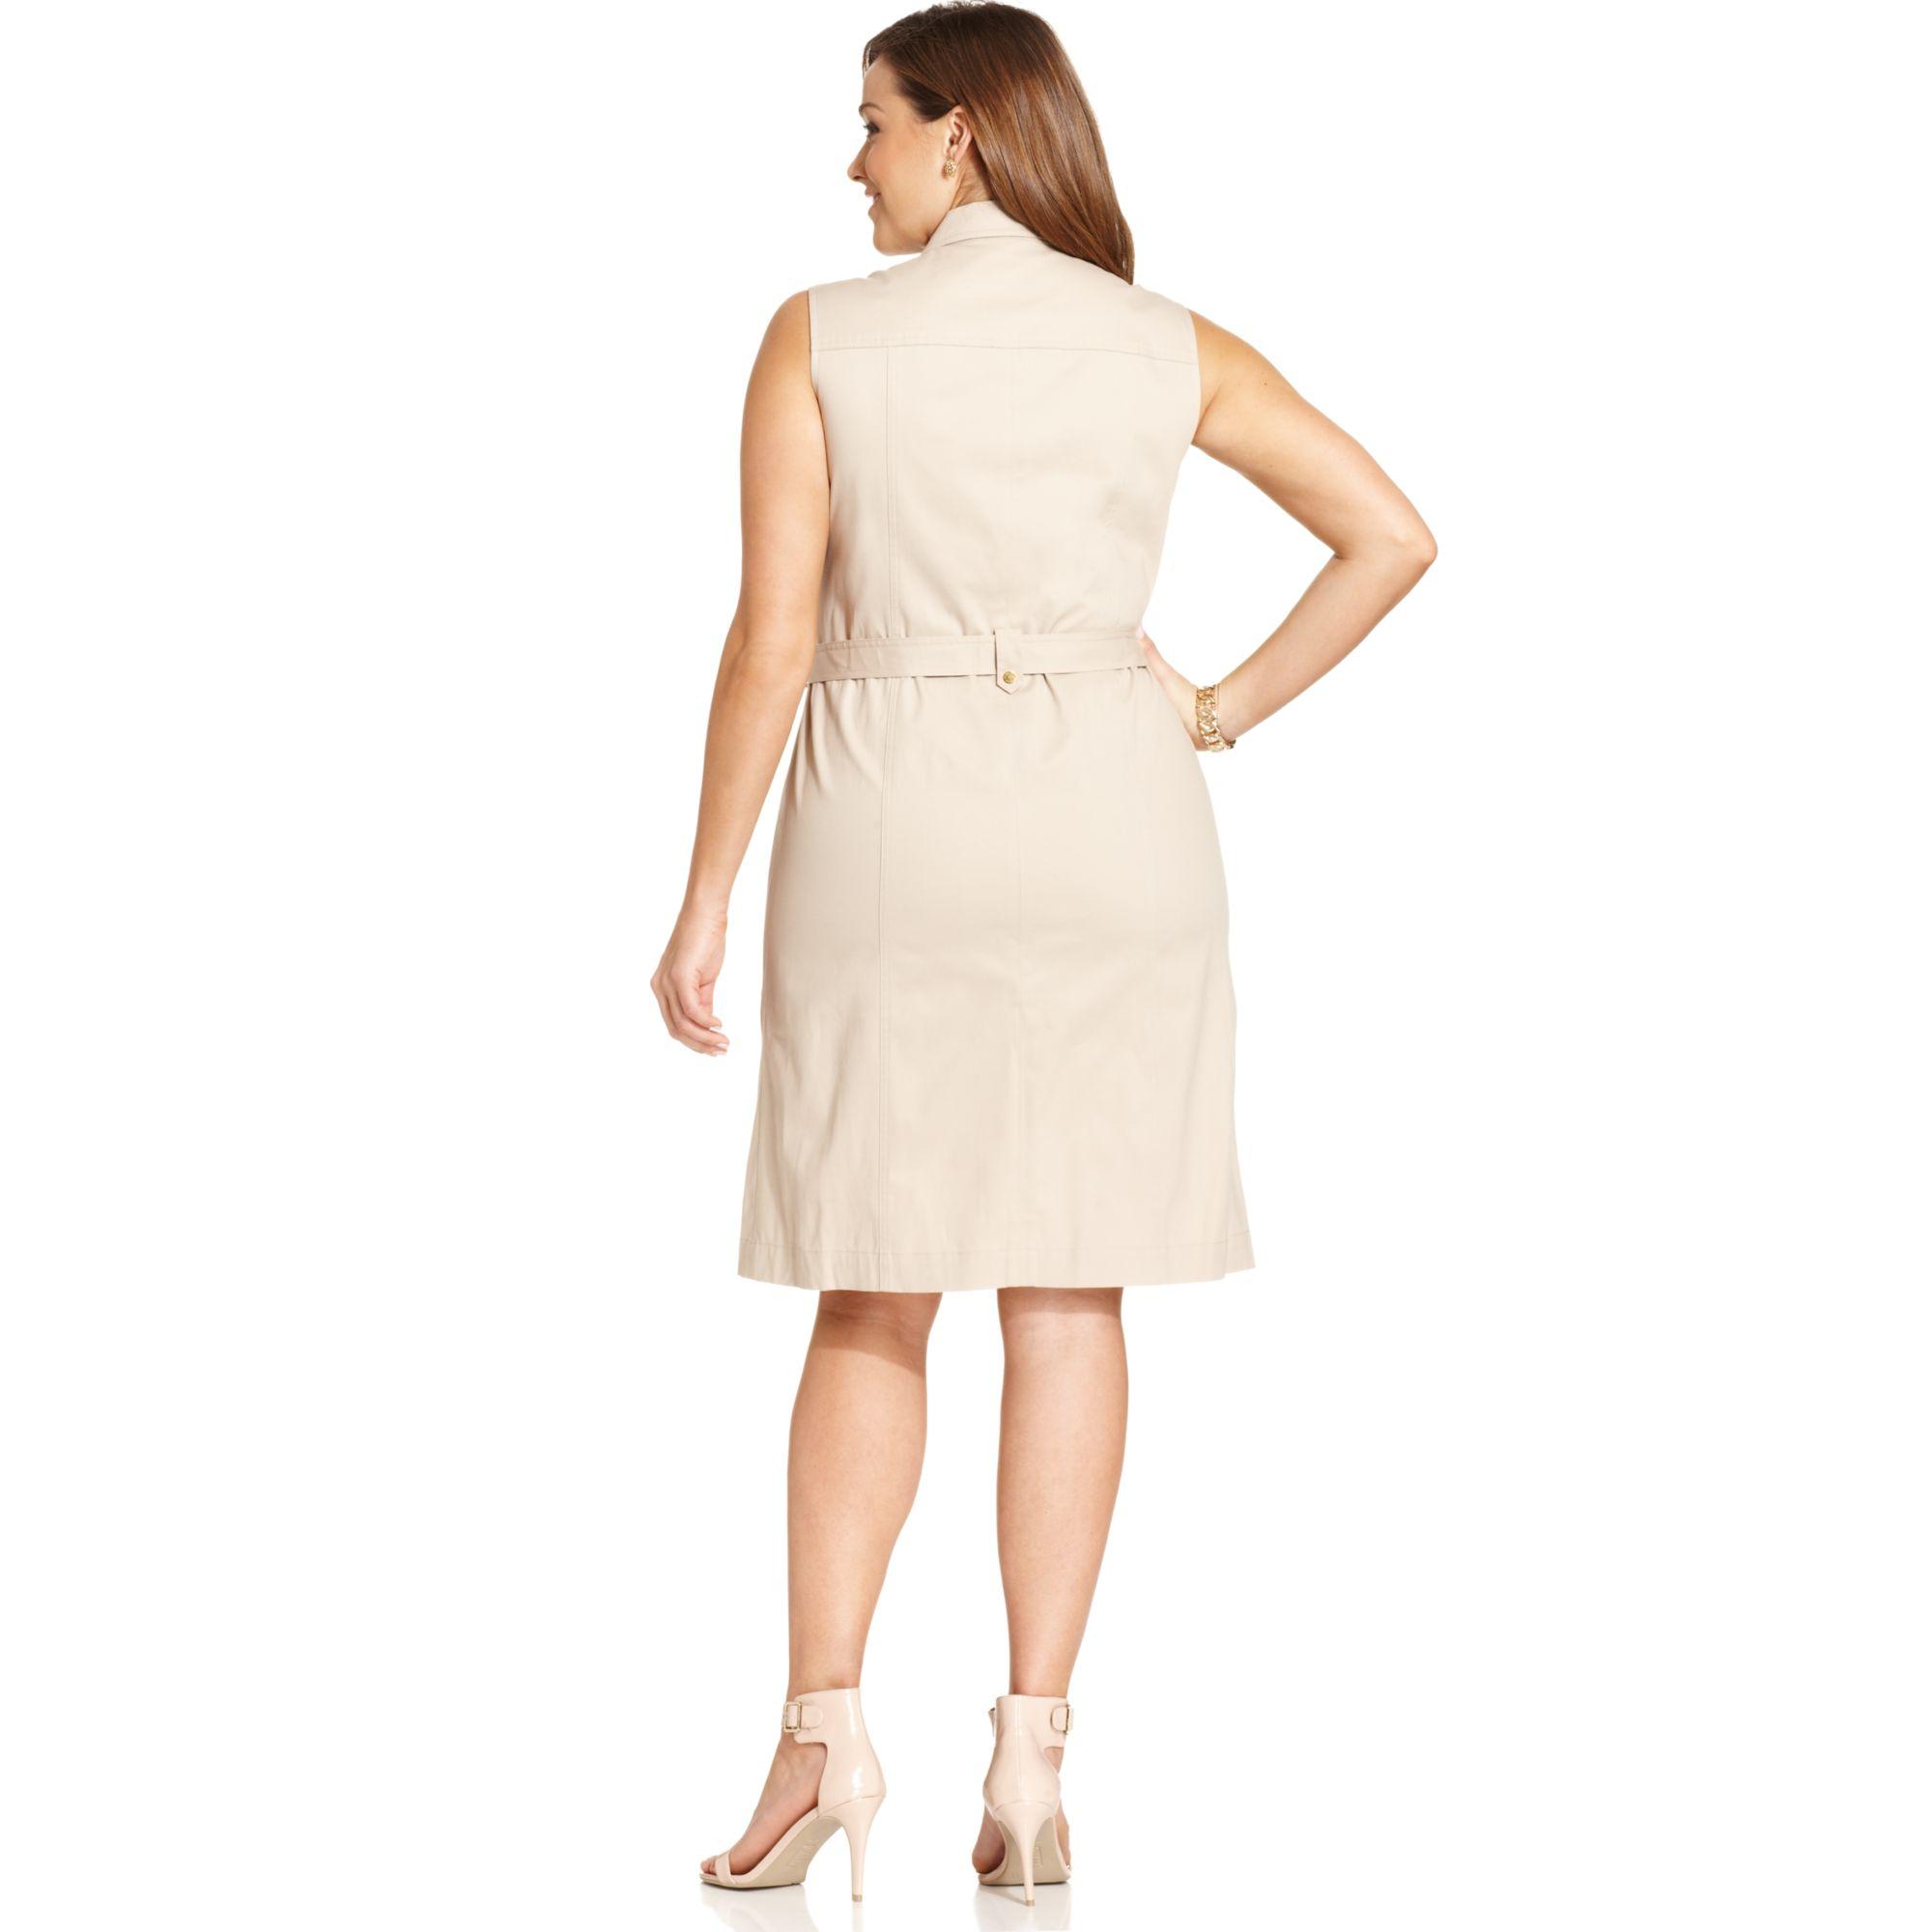 687f15bc235 Lyst - Jones New York Signature Plus Size Sleeveless Safari Dress in ...